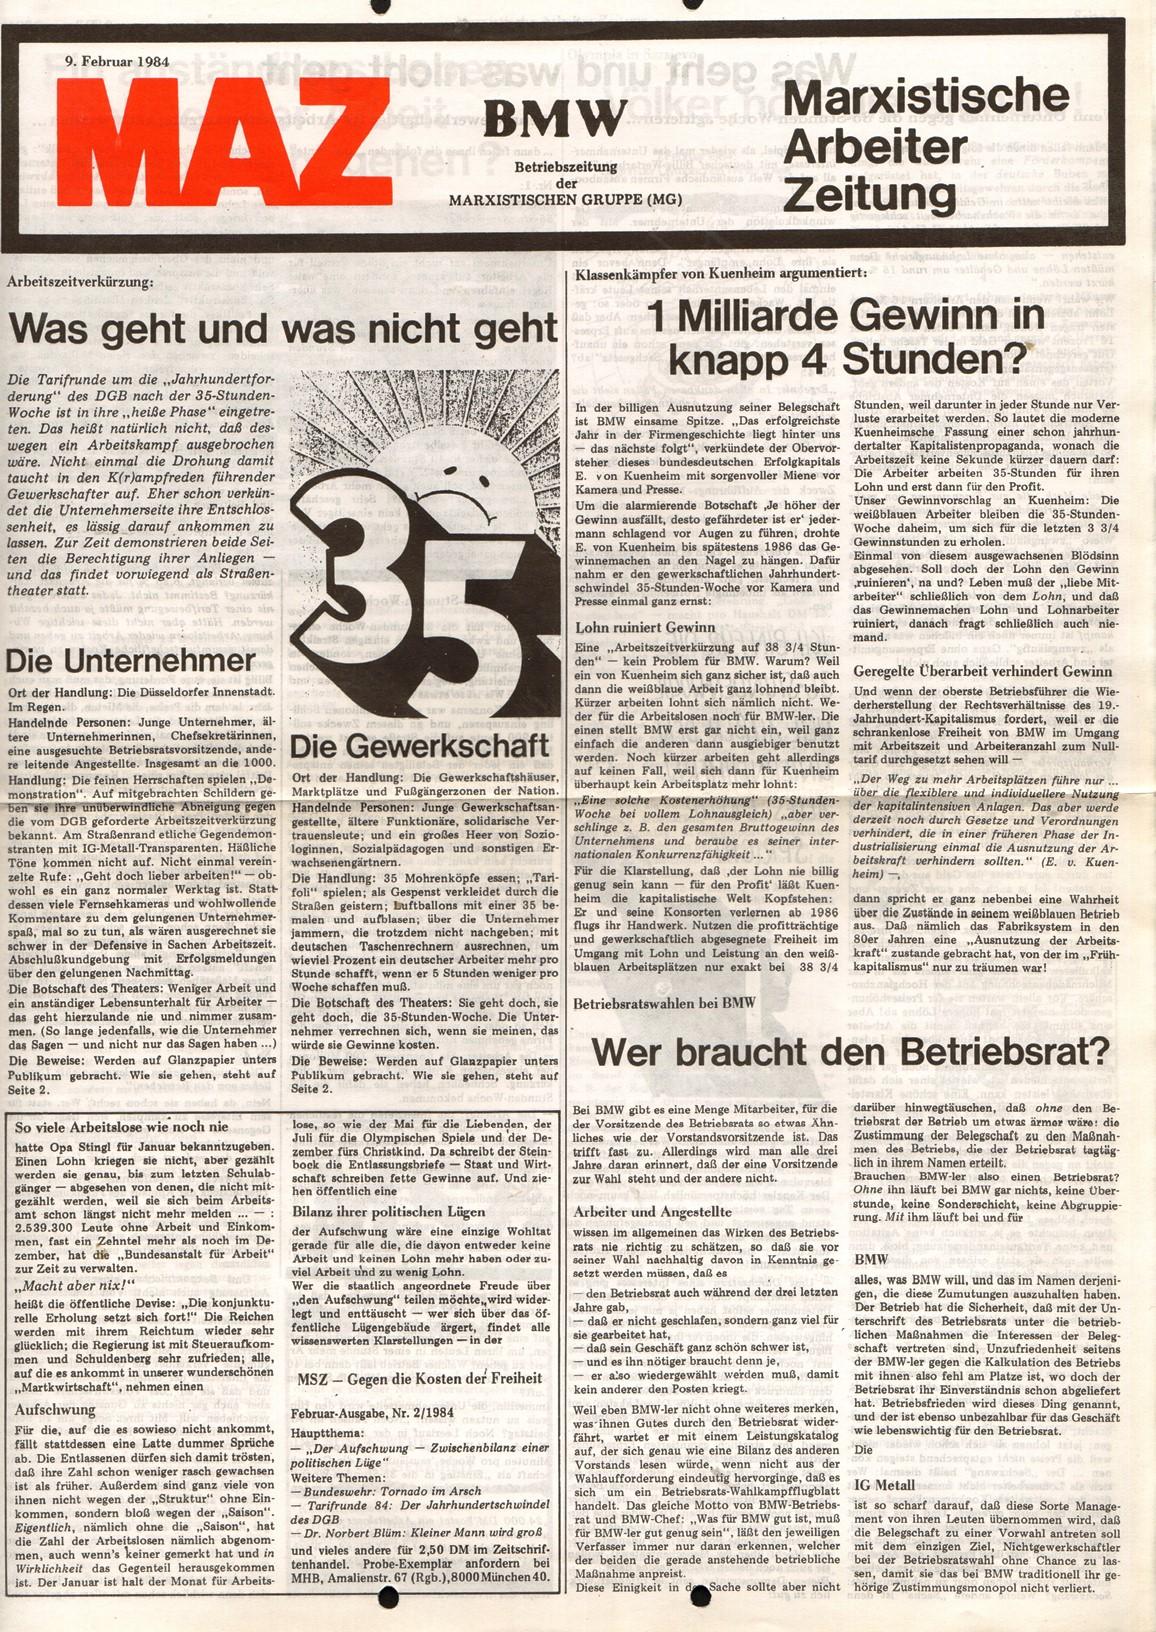 Muenchen_MG_MAZ_BMW_19840209_01